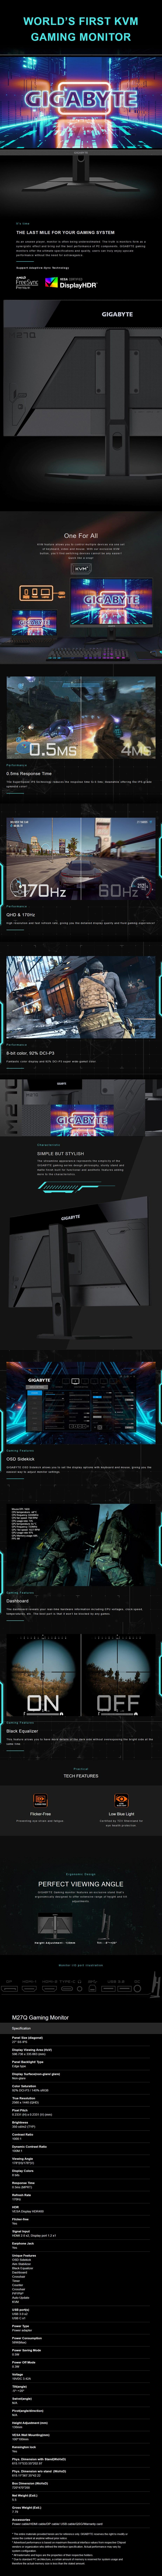 gigabyte-m27q-27-170hz-qhd-1ms-freesync-ips-gaming-monitor-with-kvm-ac38746-13.jpg